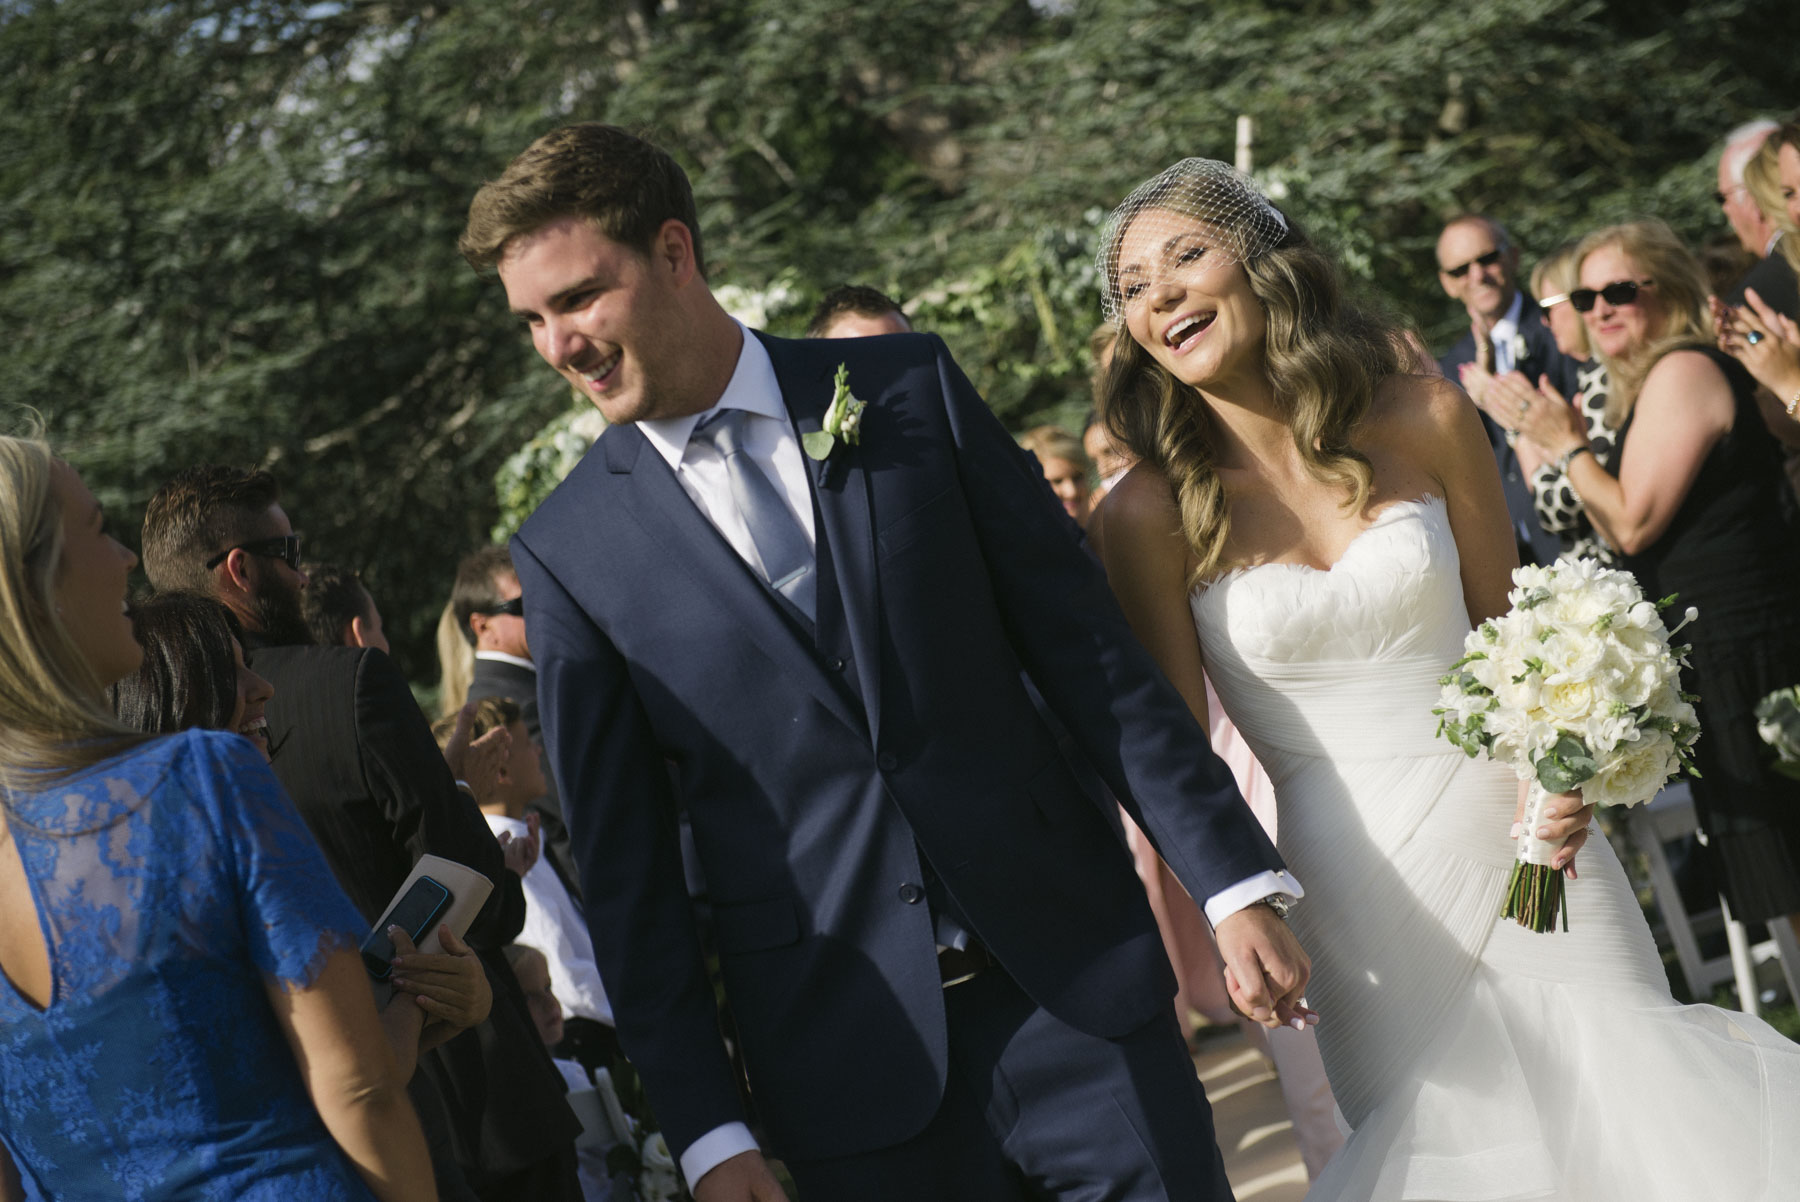 1501vand-204alan_moyle_wedding_portrait_brighton_bayside_werribee_estate_mansion_zoo_rustic_styled_garden_mansion_candid_documentry_victoria_whitelaw.jpg